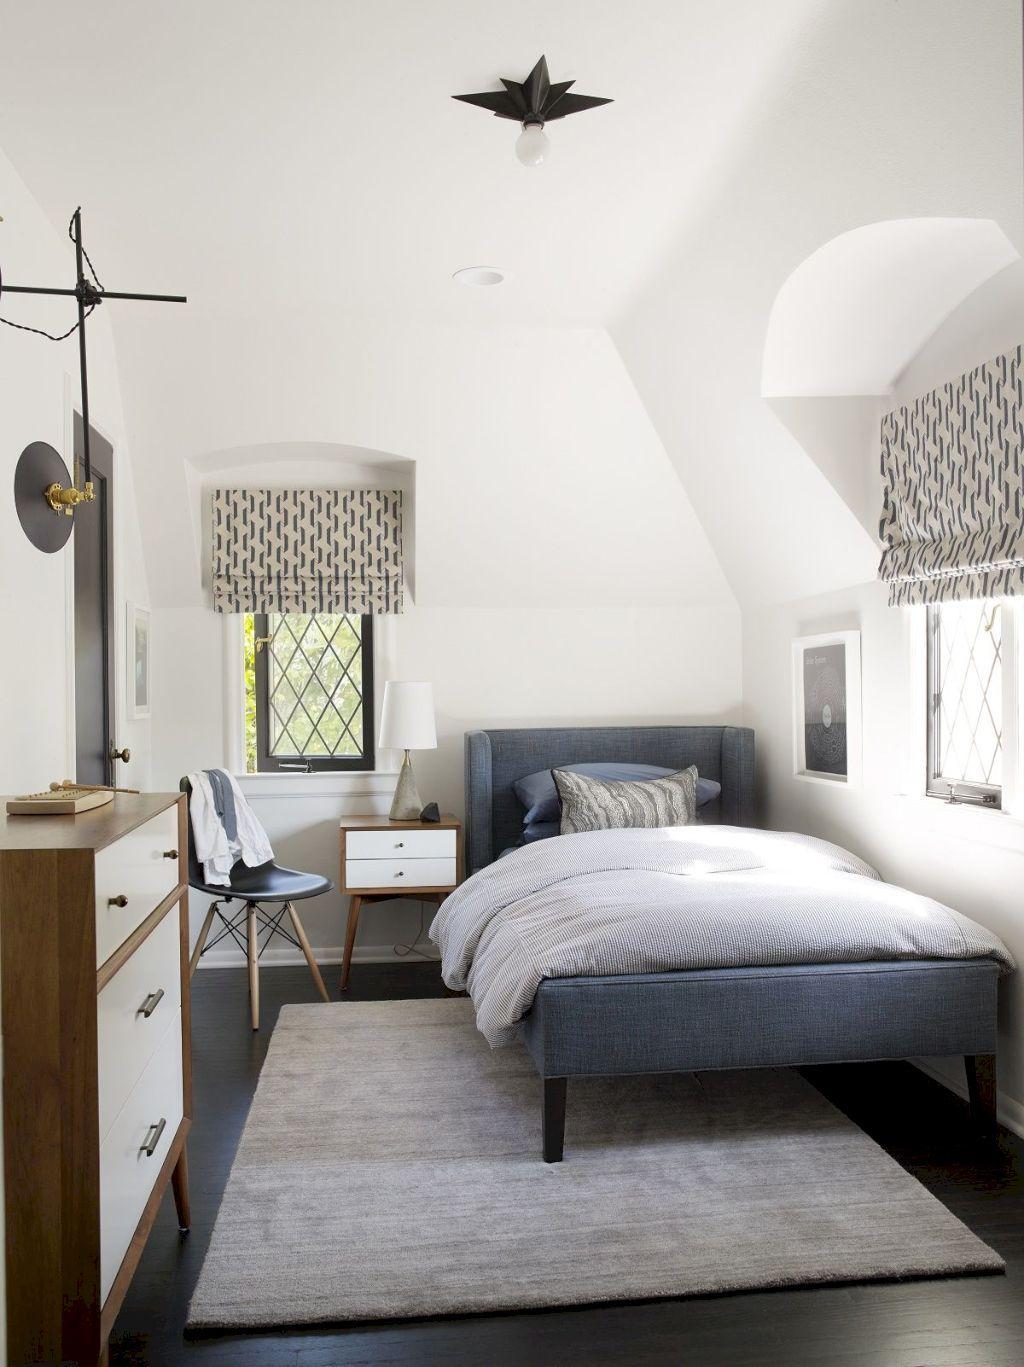 Gorgeous cozy tiny bedroom remodel ideas https homeideas also design rh pinterest